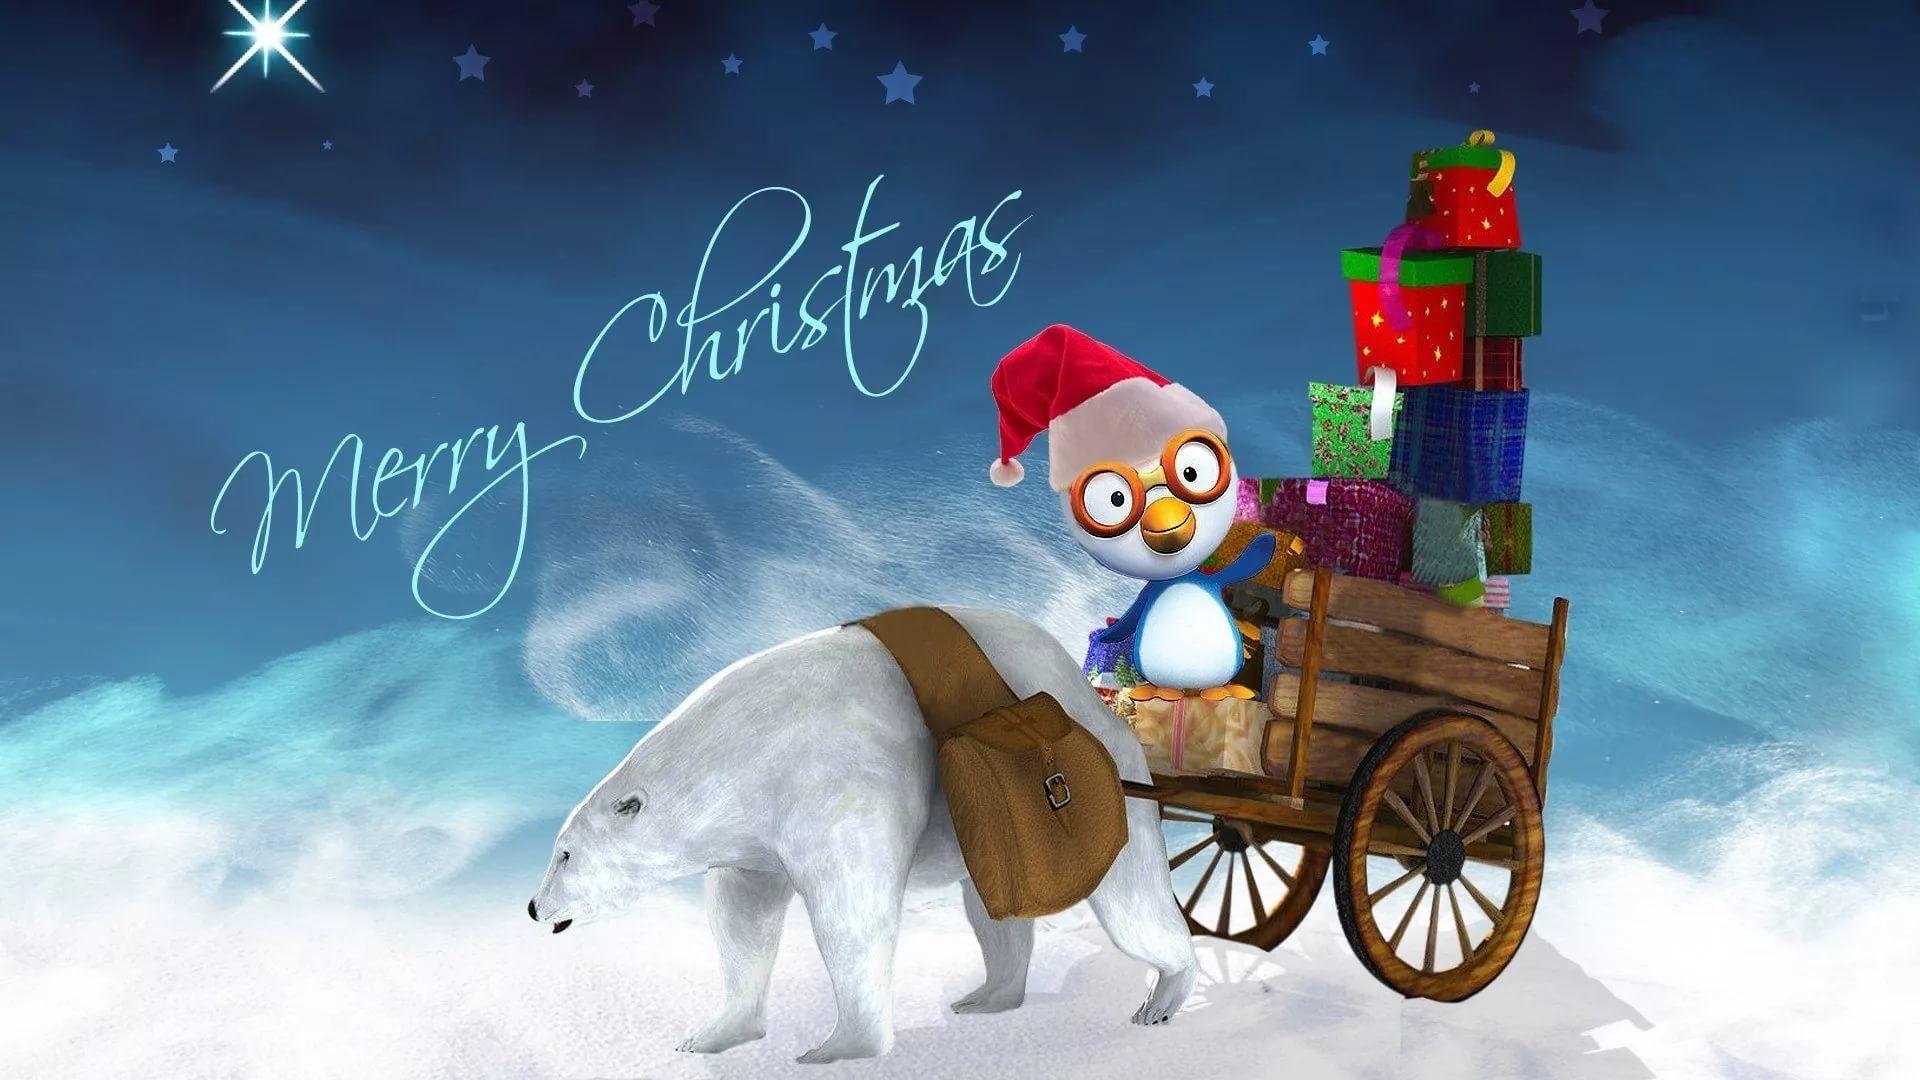 Merry Christmas Nice Wallpaper